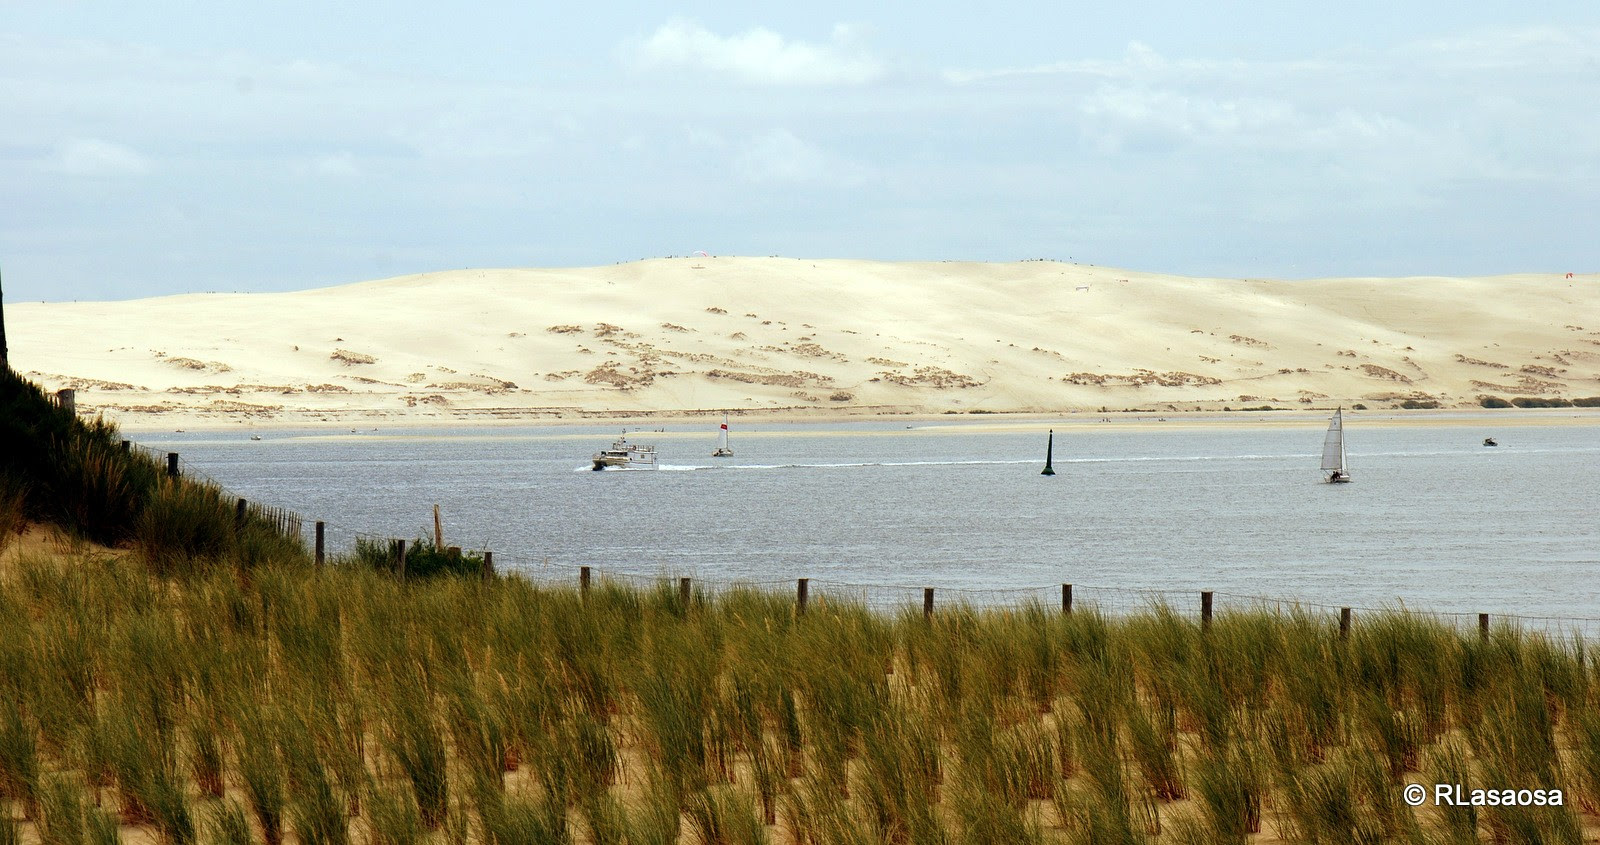 rwH5R Dune de Pyla   A new Sahara desert being born   in France! [30 pics]